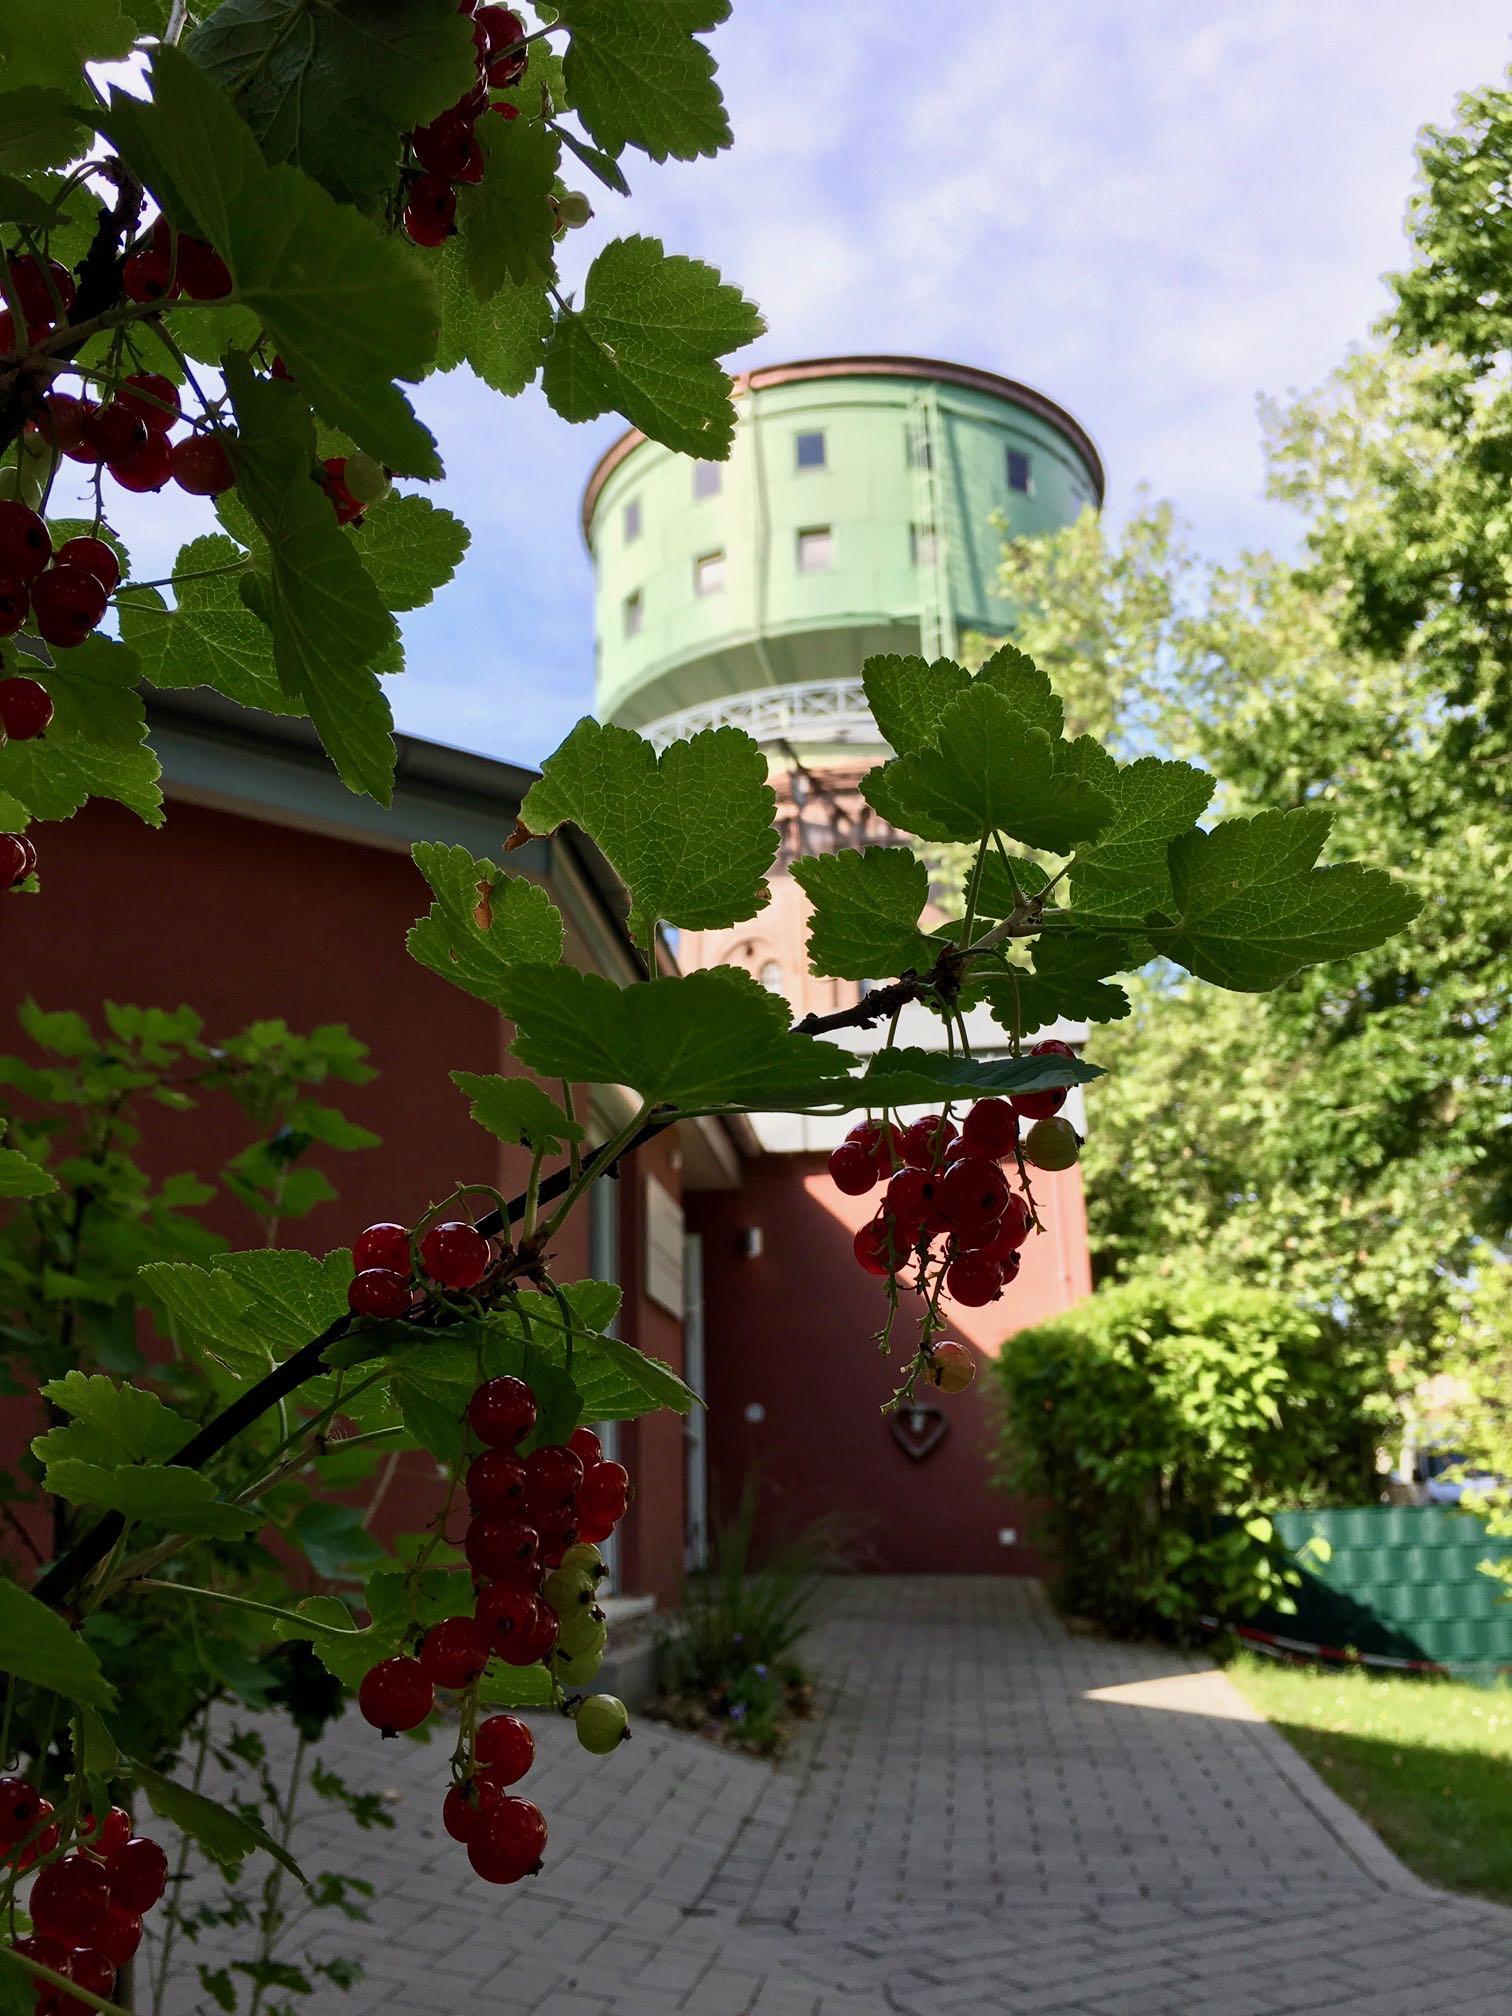 Kirchengemeinde Koenigssteele